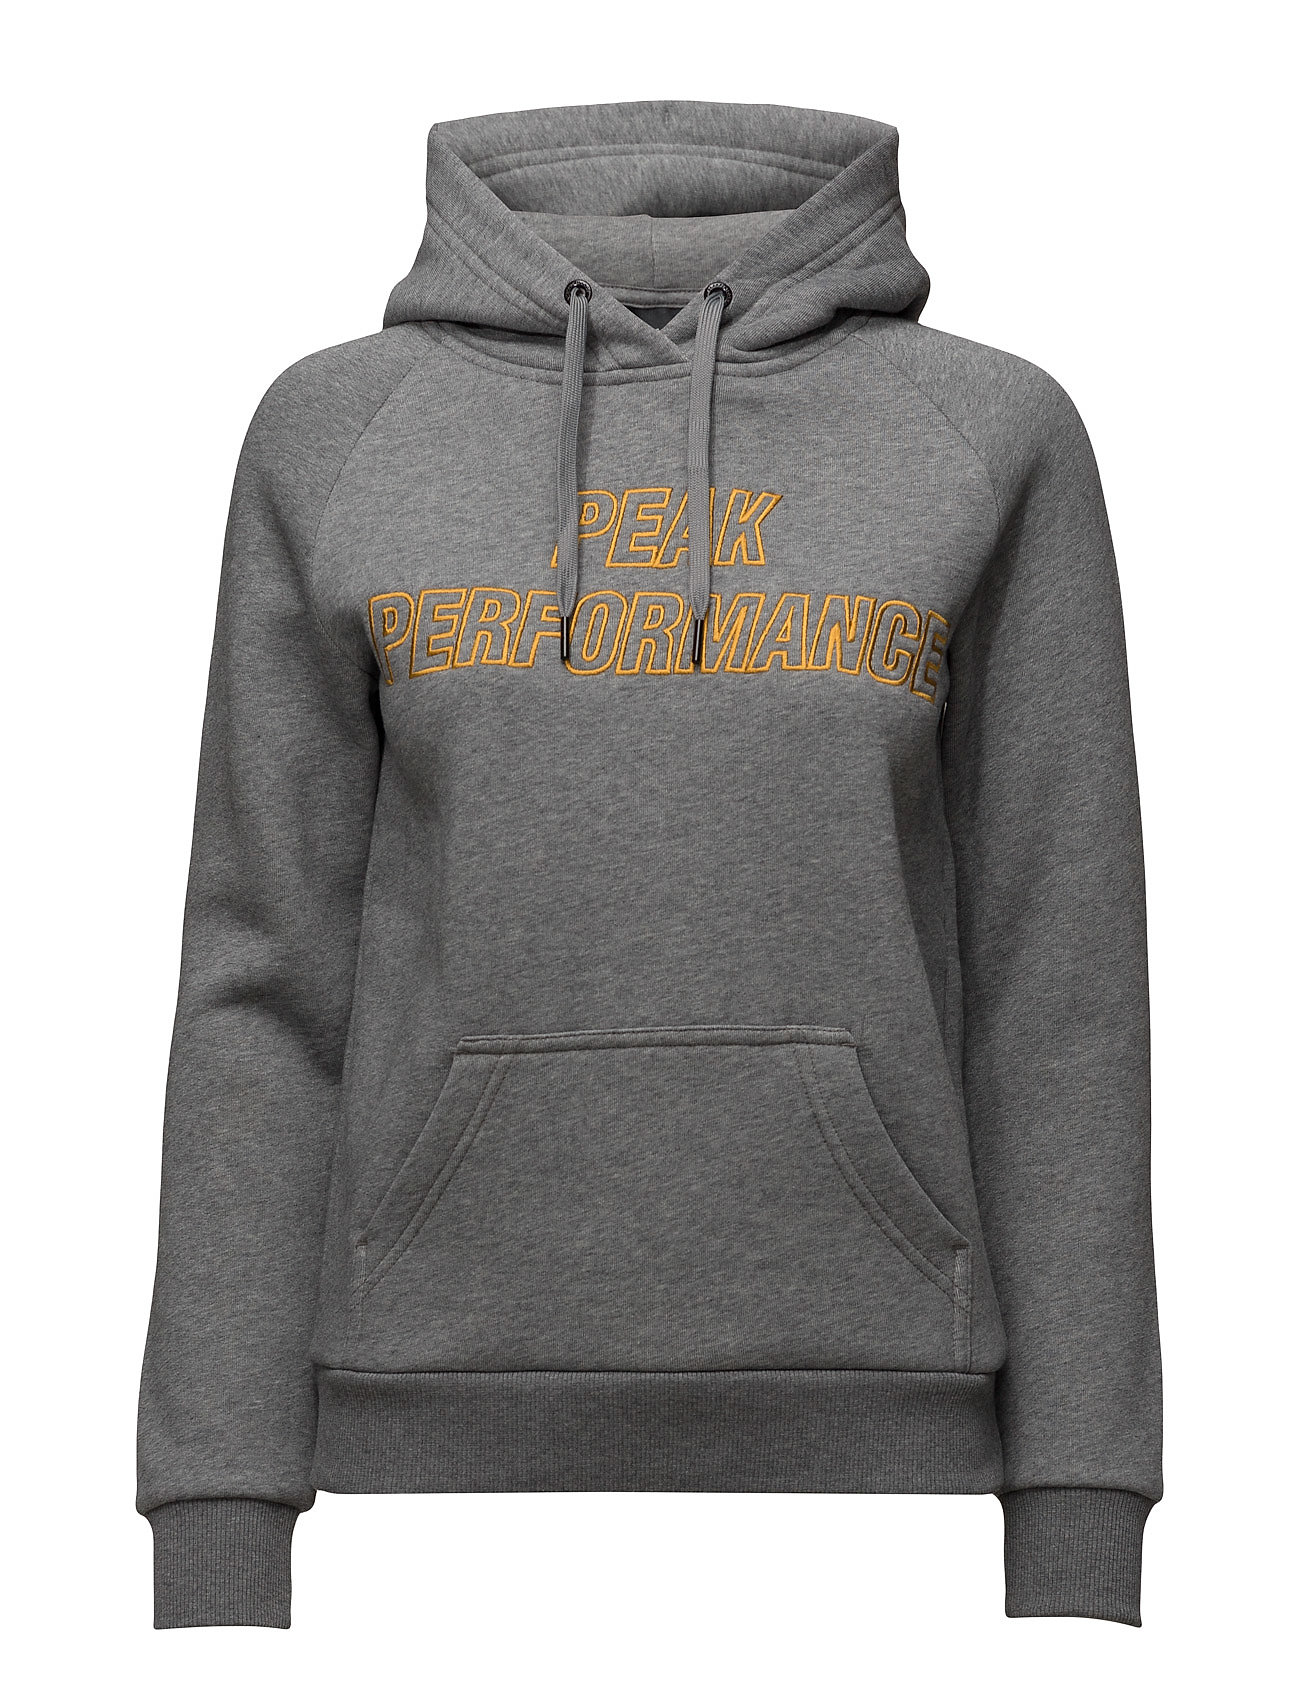 W Sweat H Peak Performance Sweatshirts til Damer i Grey Melange